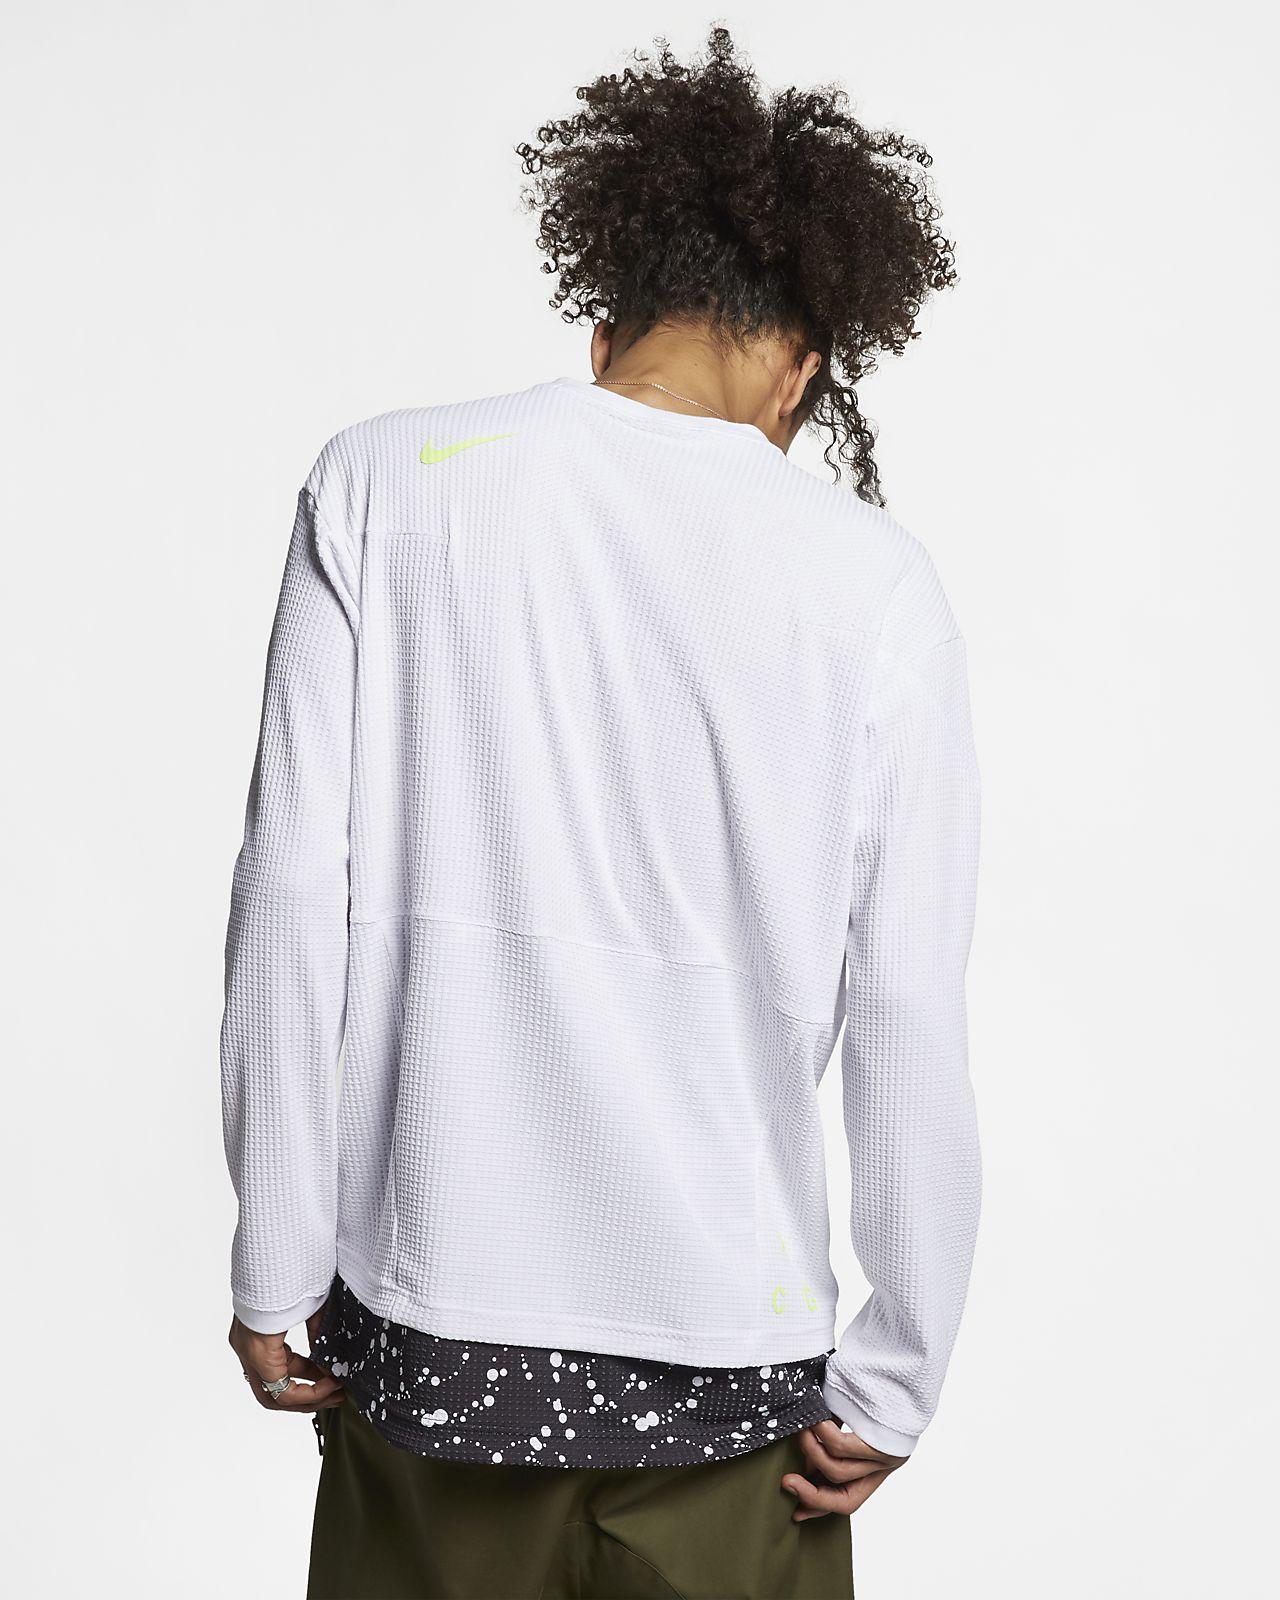 a1090f7d5b988 NikeLab ACG Men's Long-Sleeve Top. Nike.com